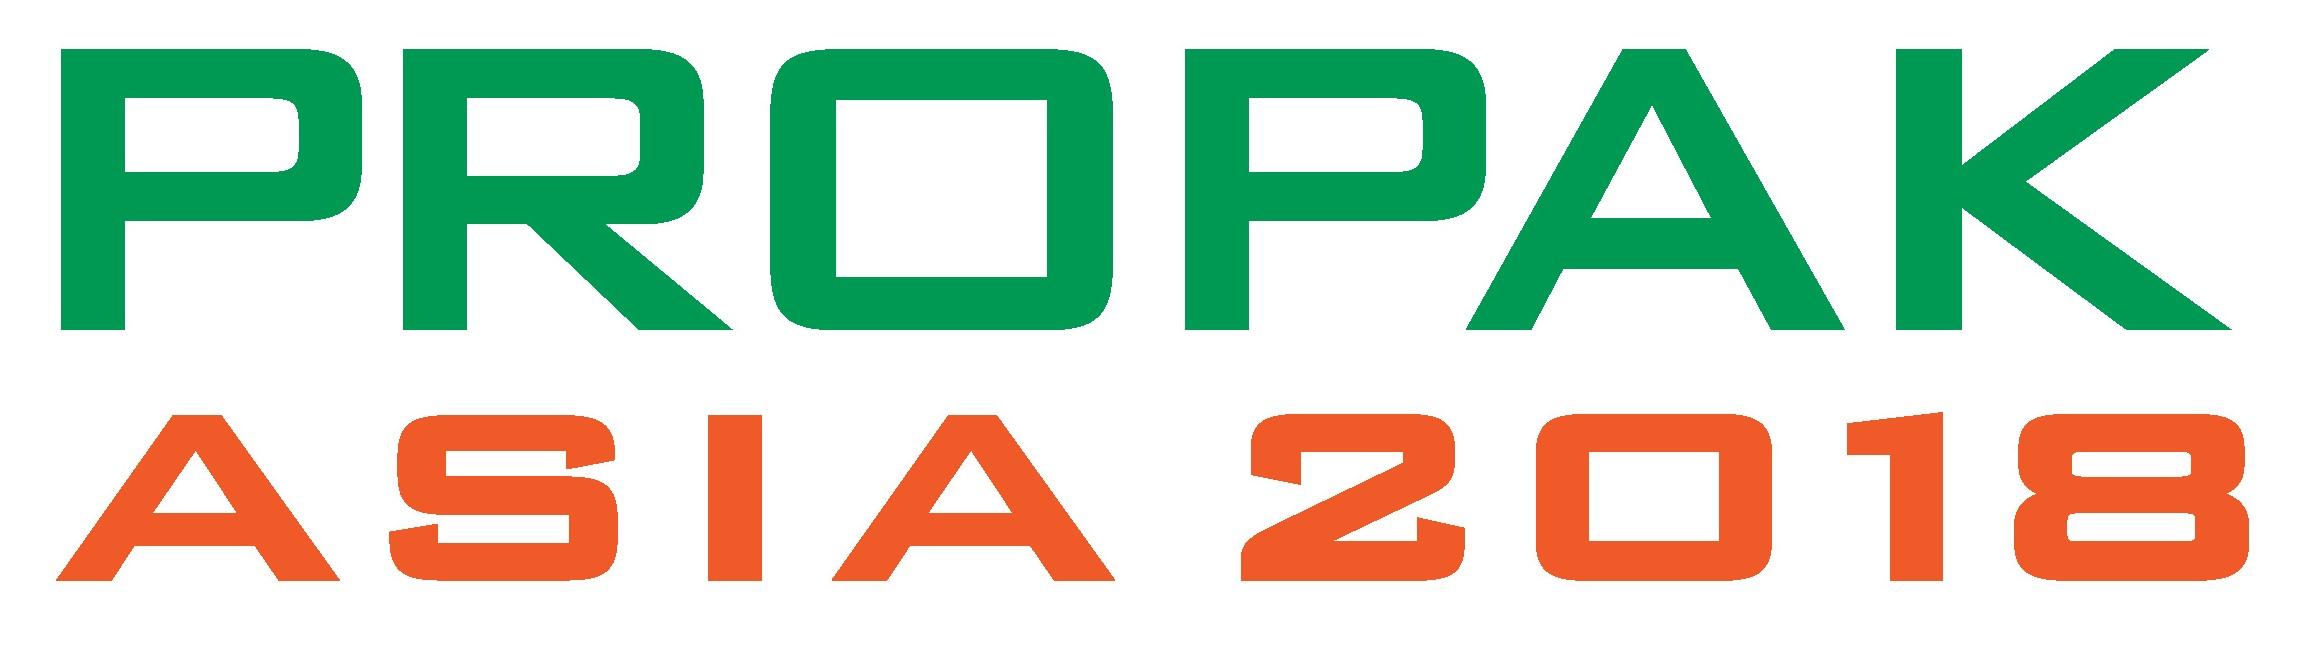 PPAsia_2018_Logo-01